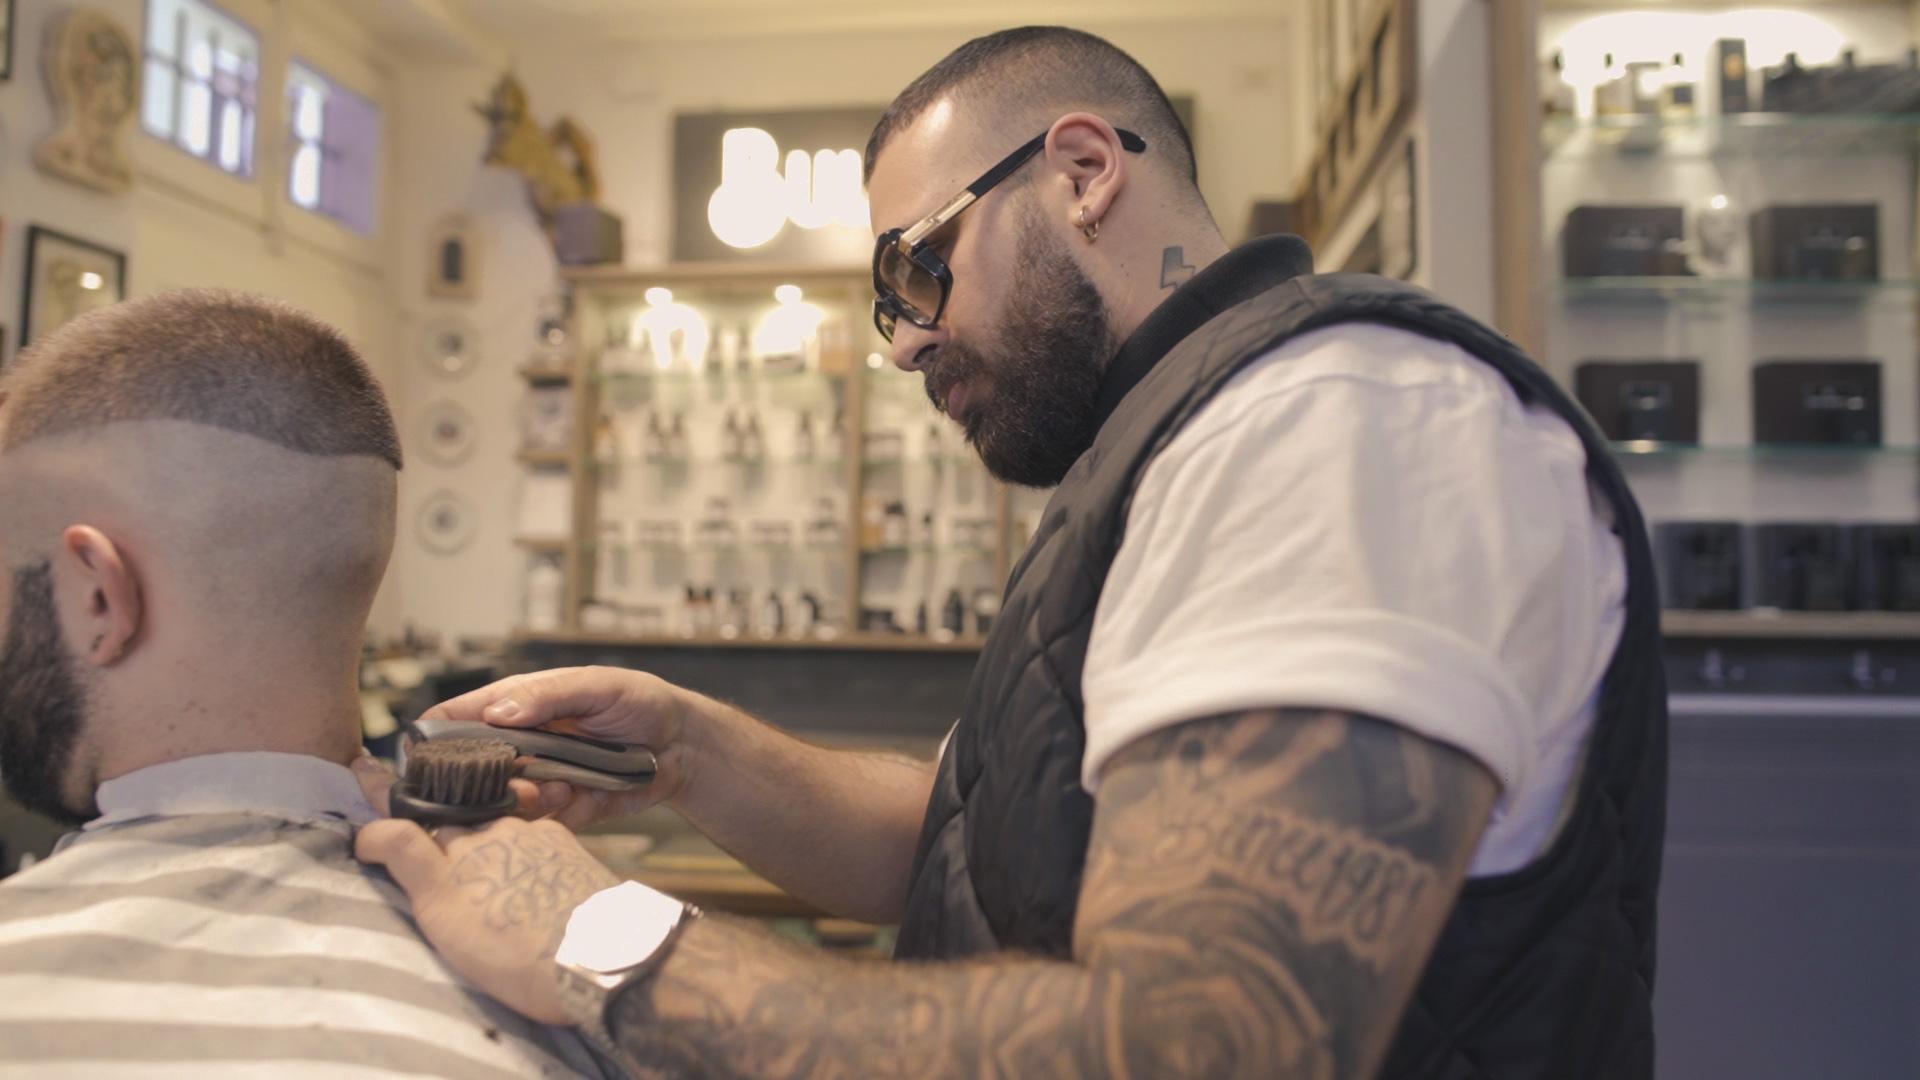 Barber's Chairs - Bullfrog Barbershop - Nicola Crocco 03